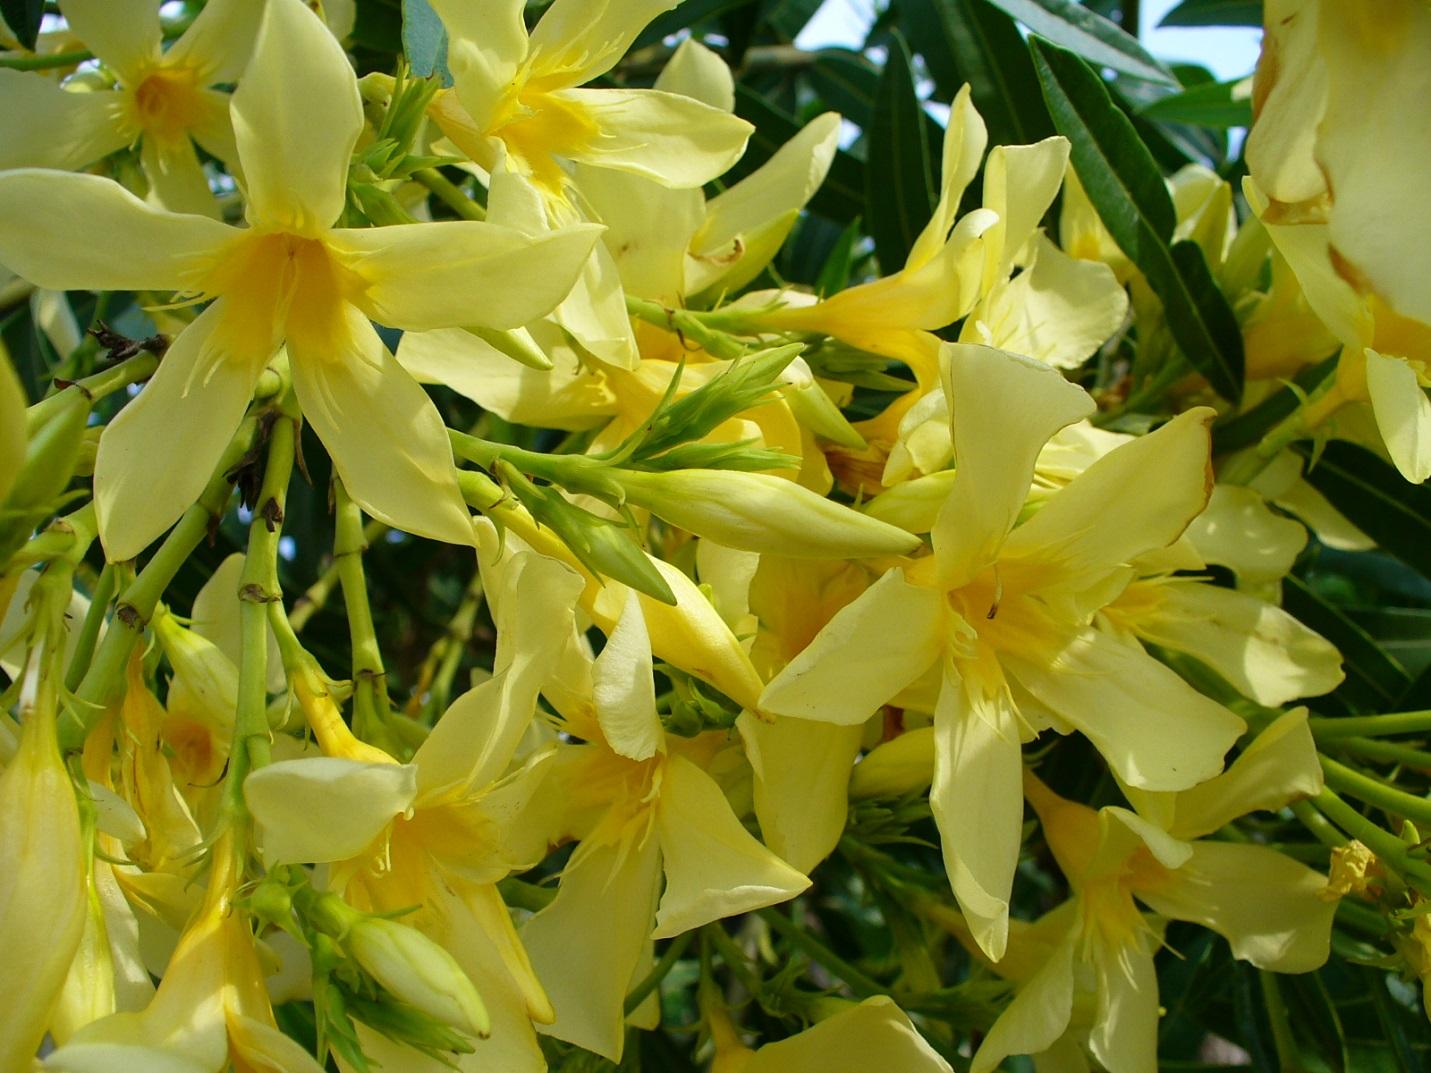 Желтые цветки олеандра